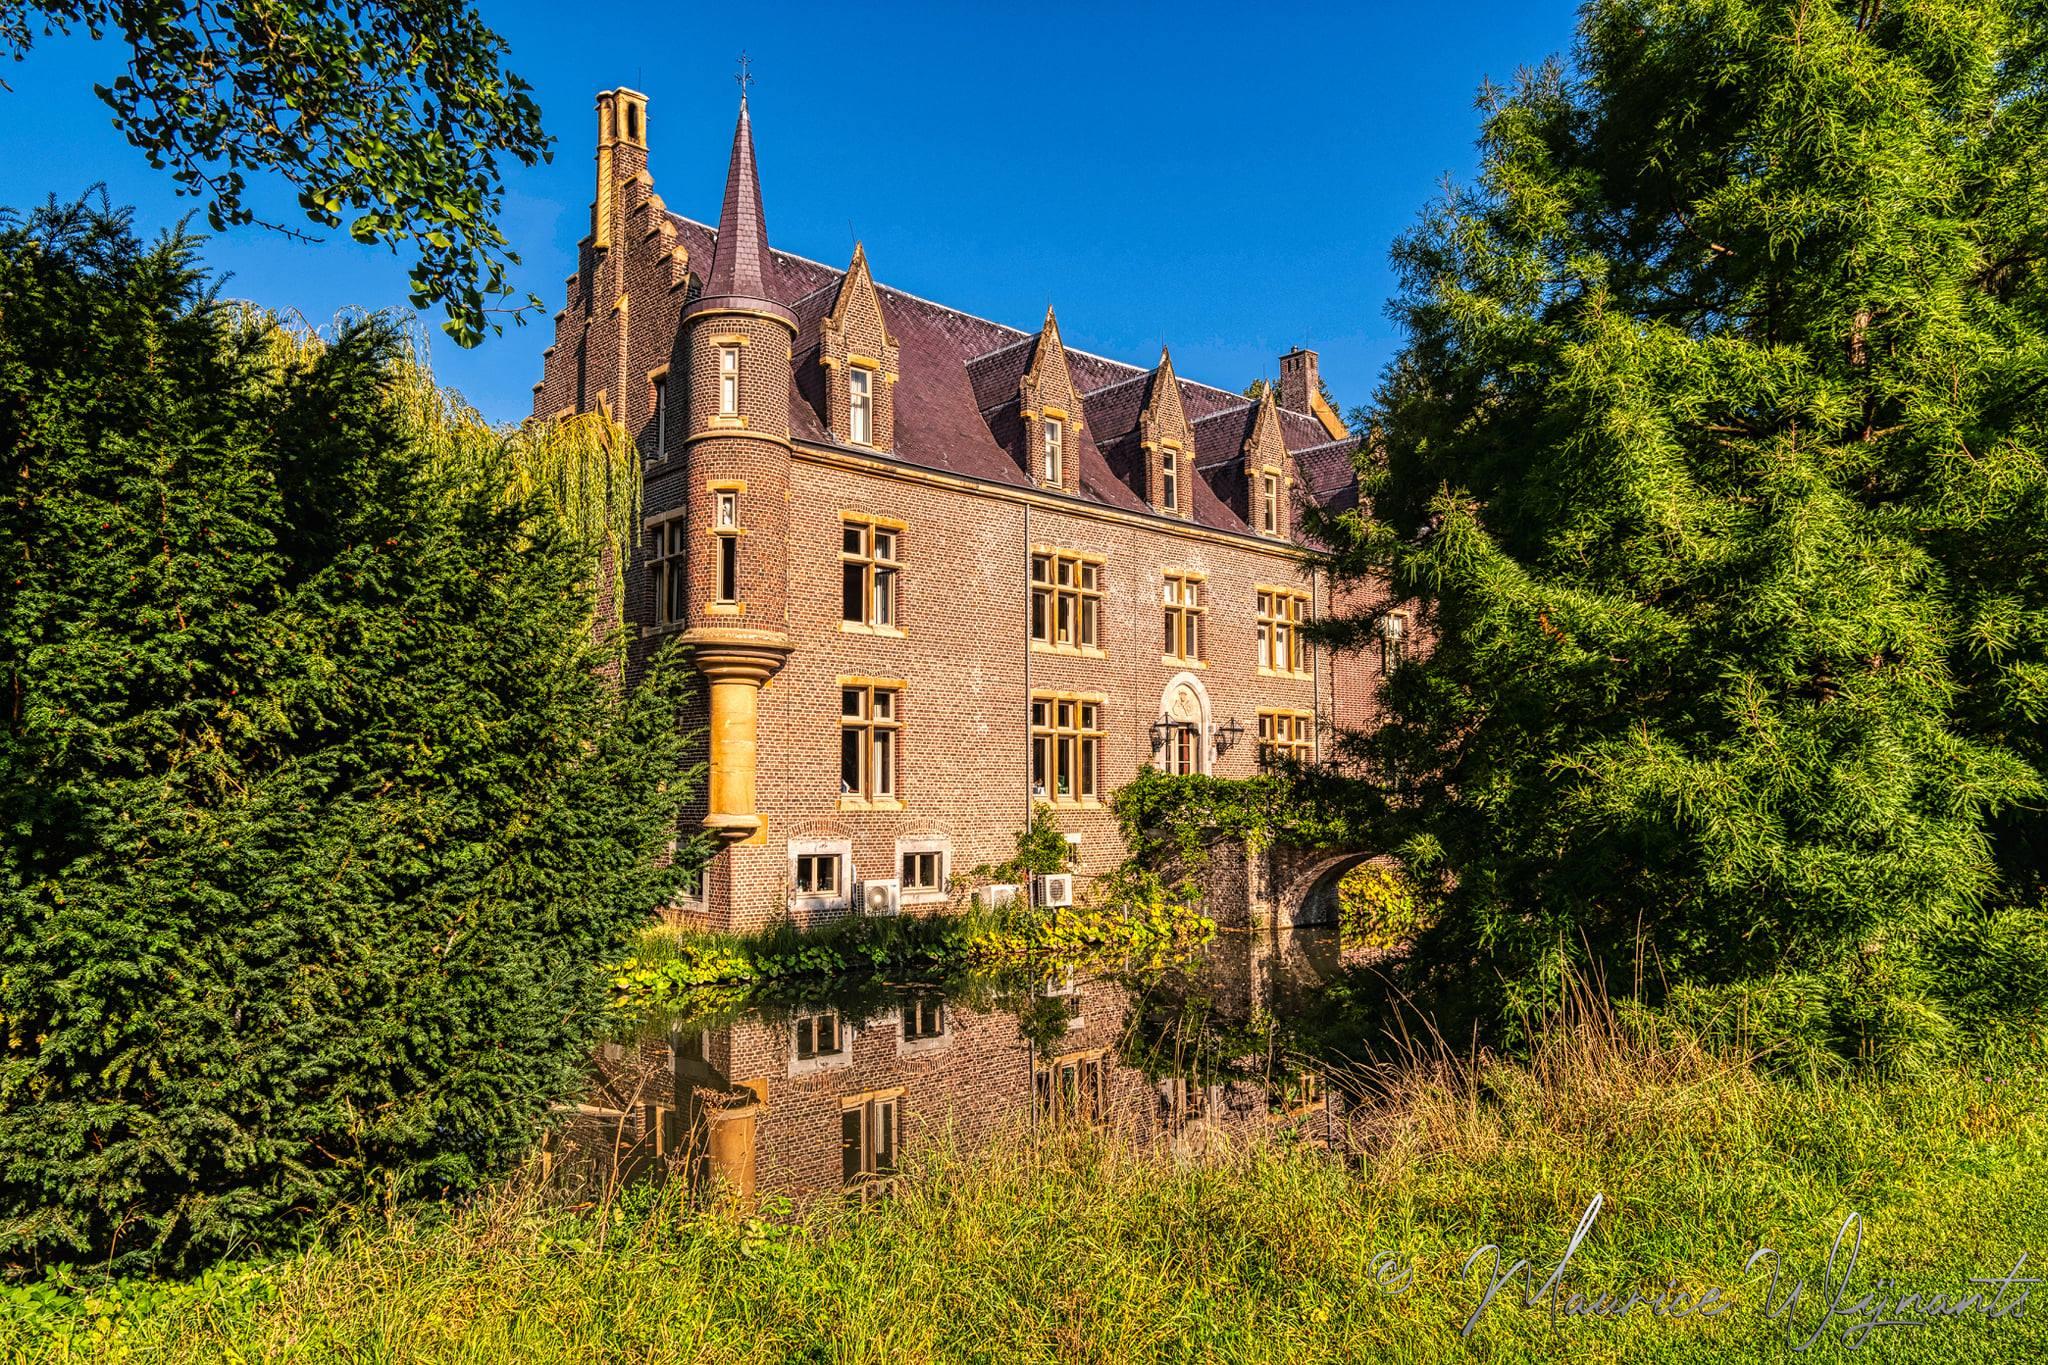 Castle TerWorm, Netherlands